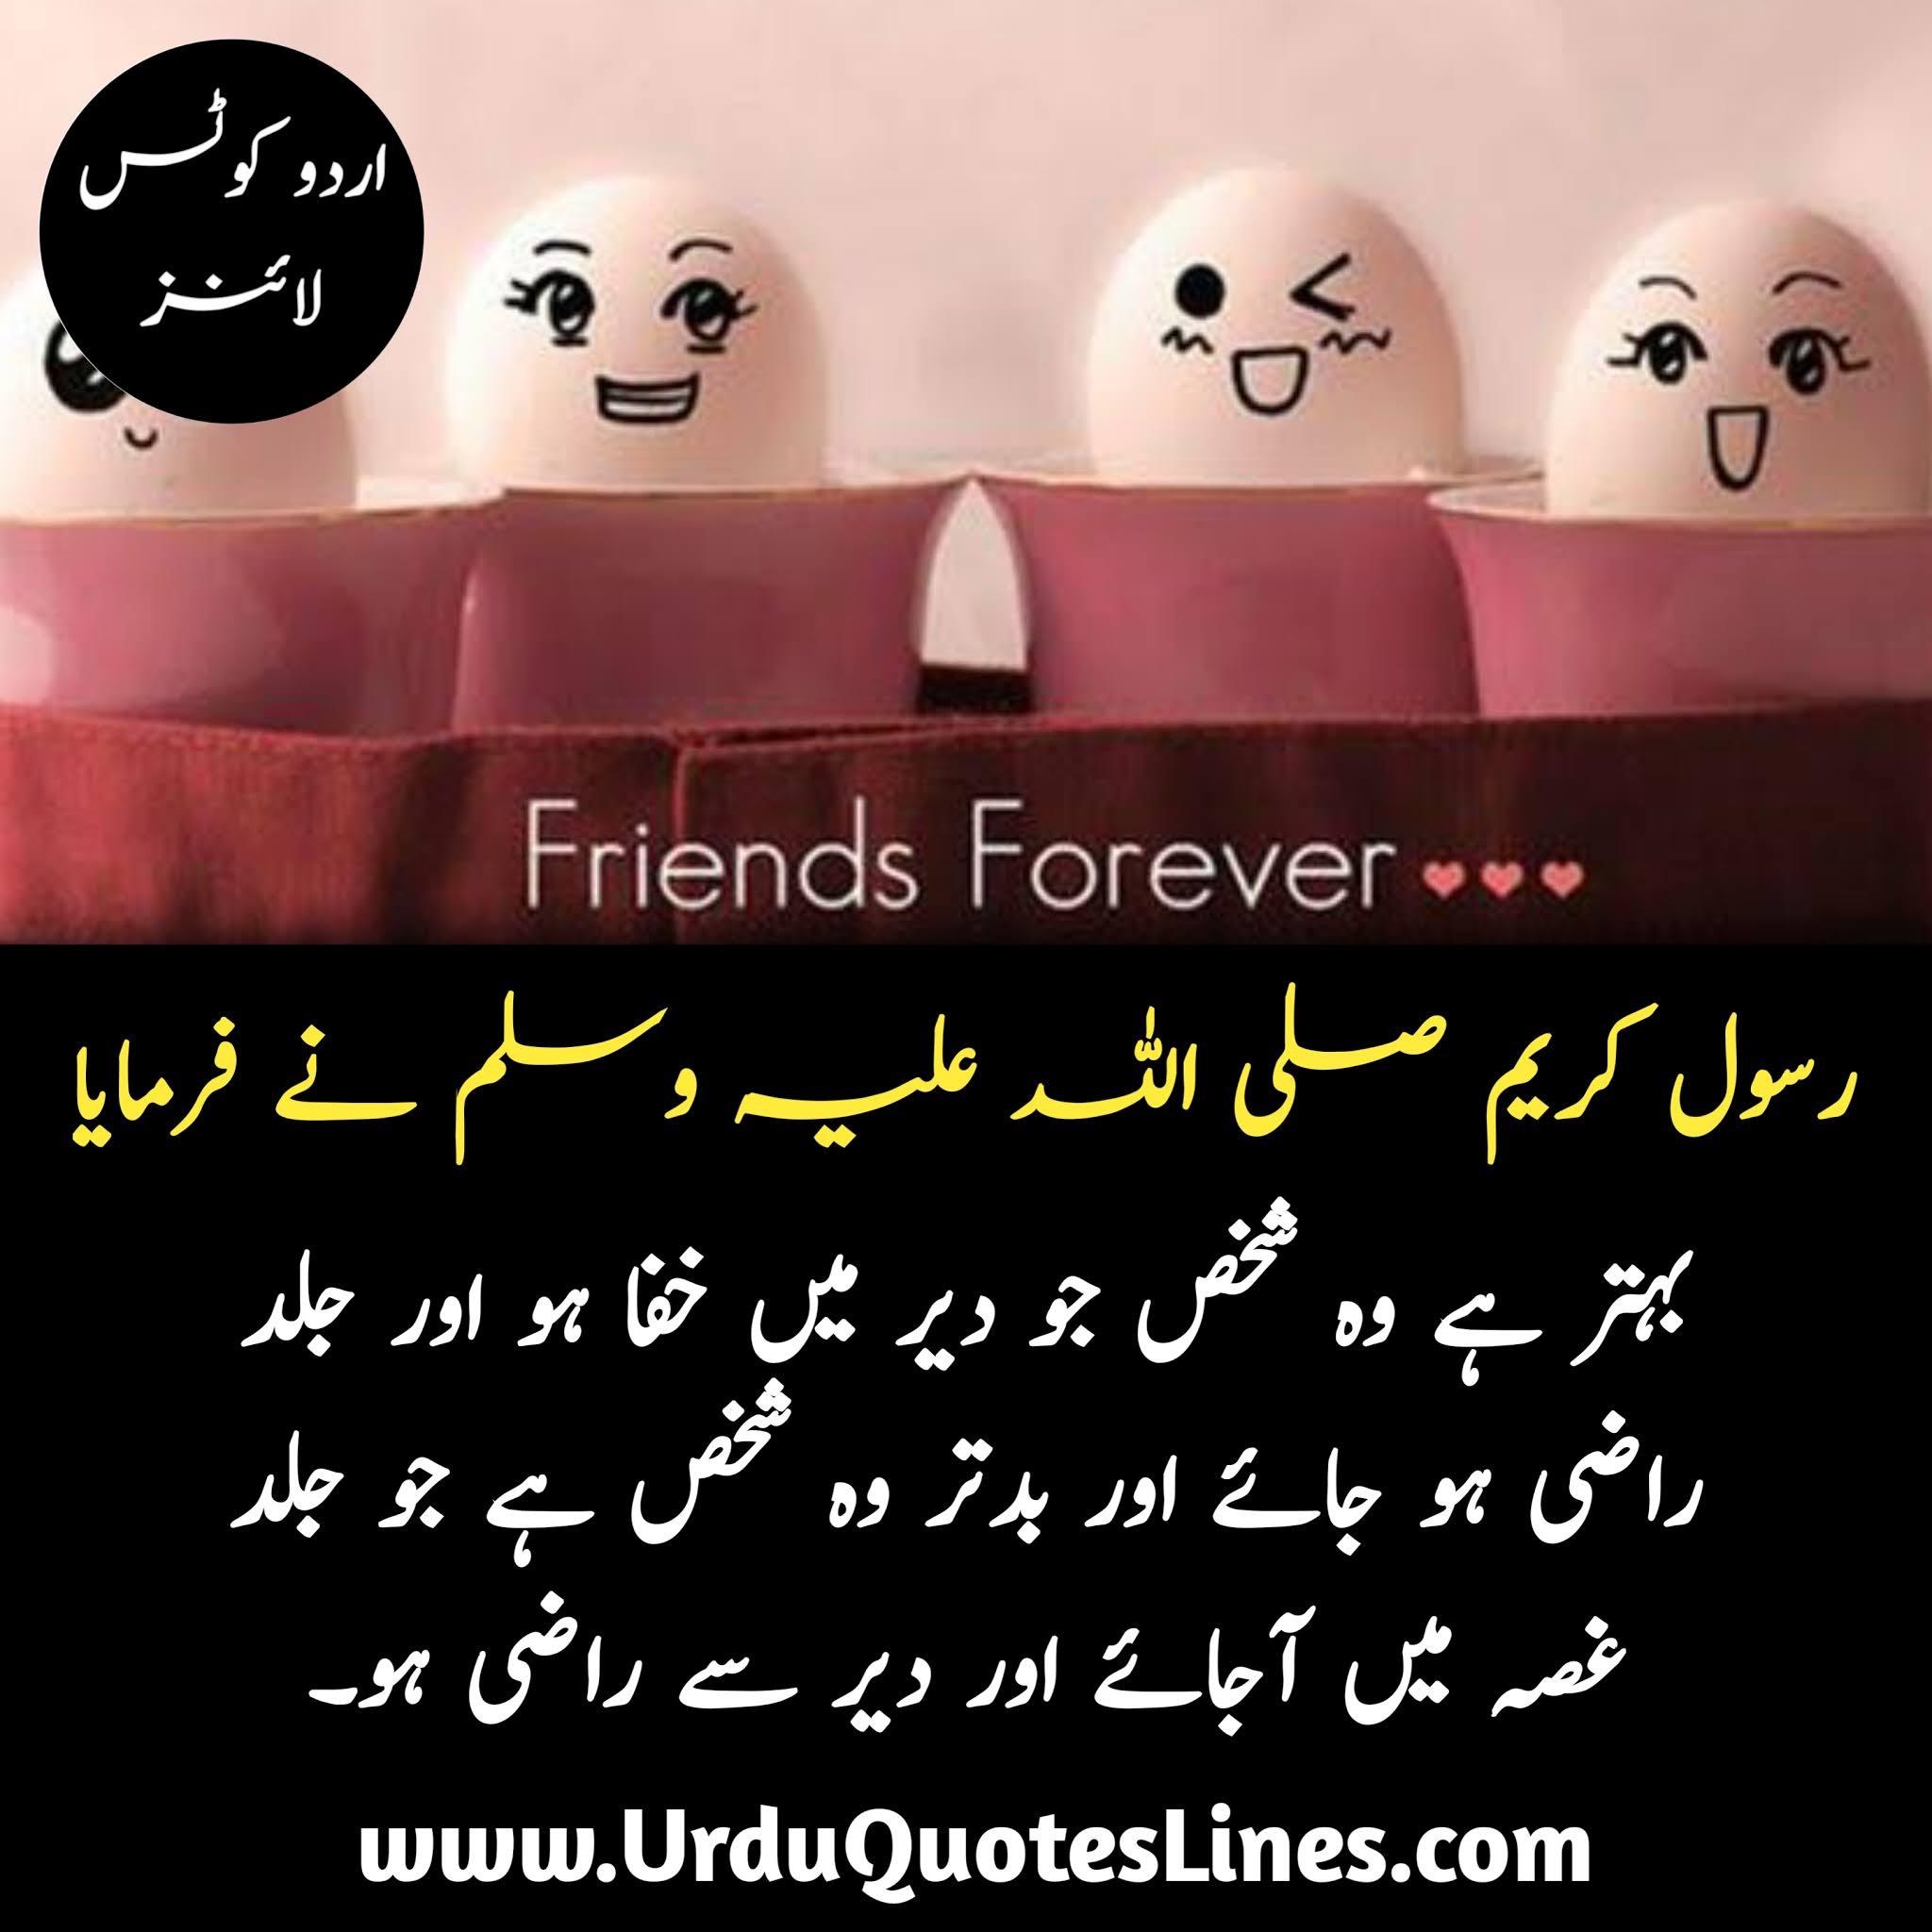 Prophet Muhammad Urdu Quotes Lines About Relationship